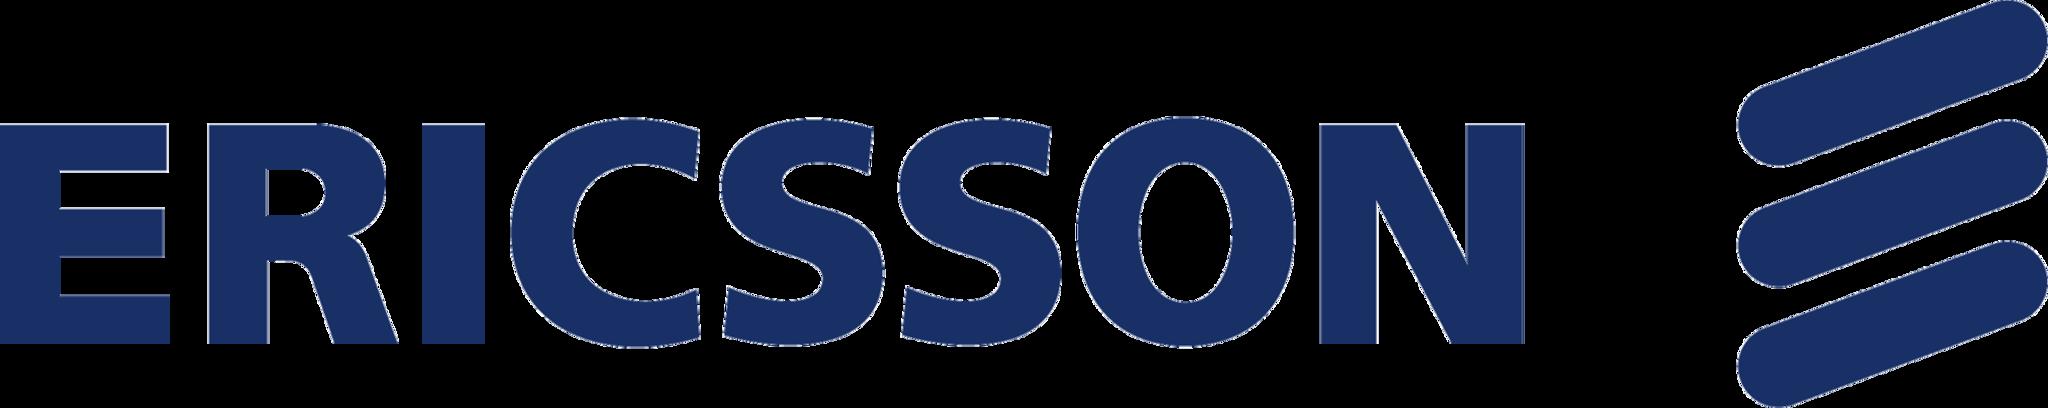 Sponsored by Ericsson